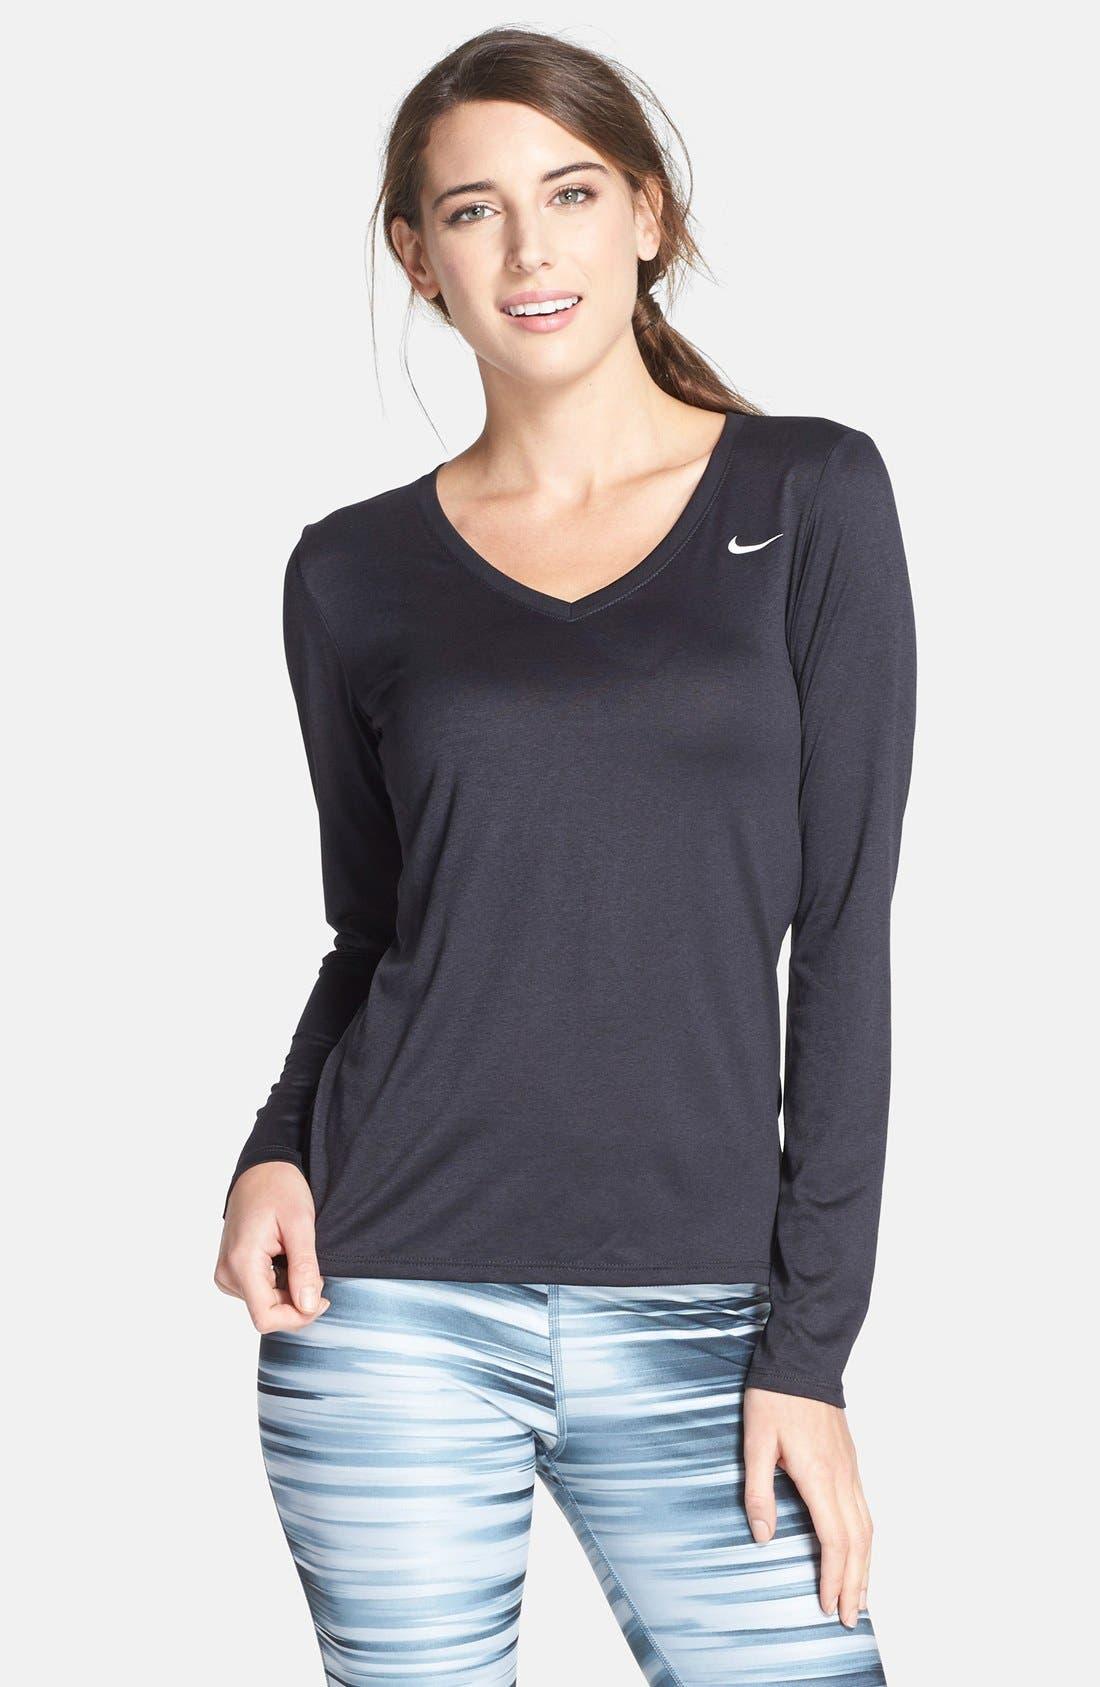 Alternate Image 1 Selected - Nike 'Legend' Dri-FIT V-Neck Long Sleeve Sport Top